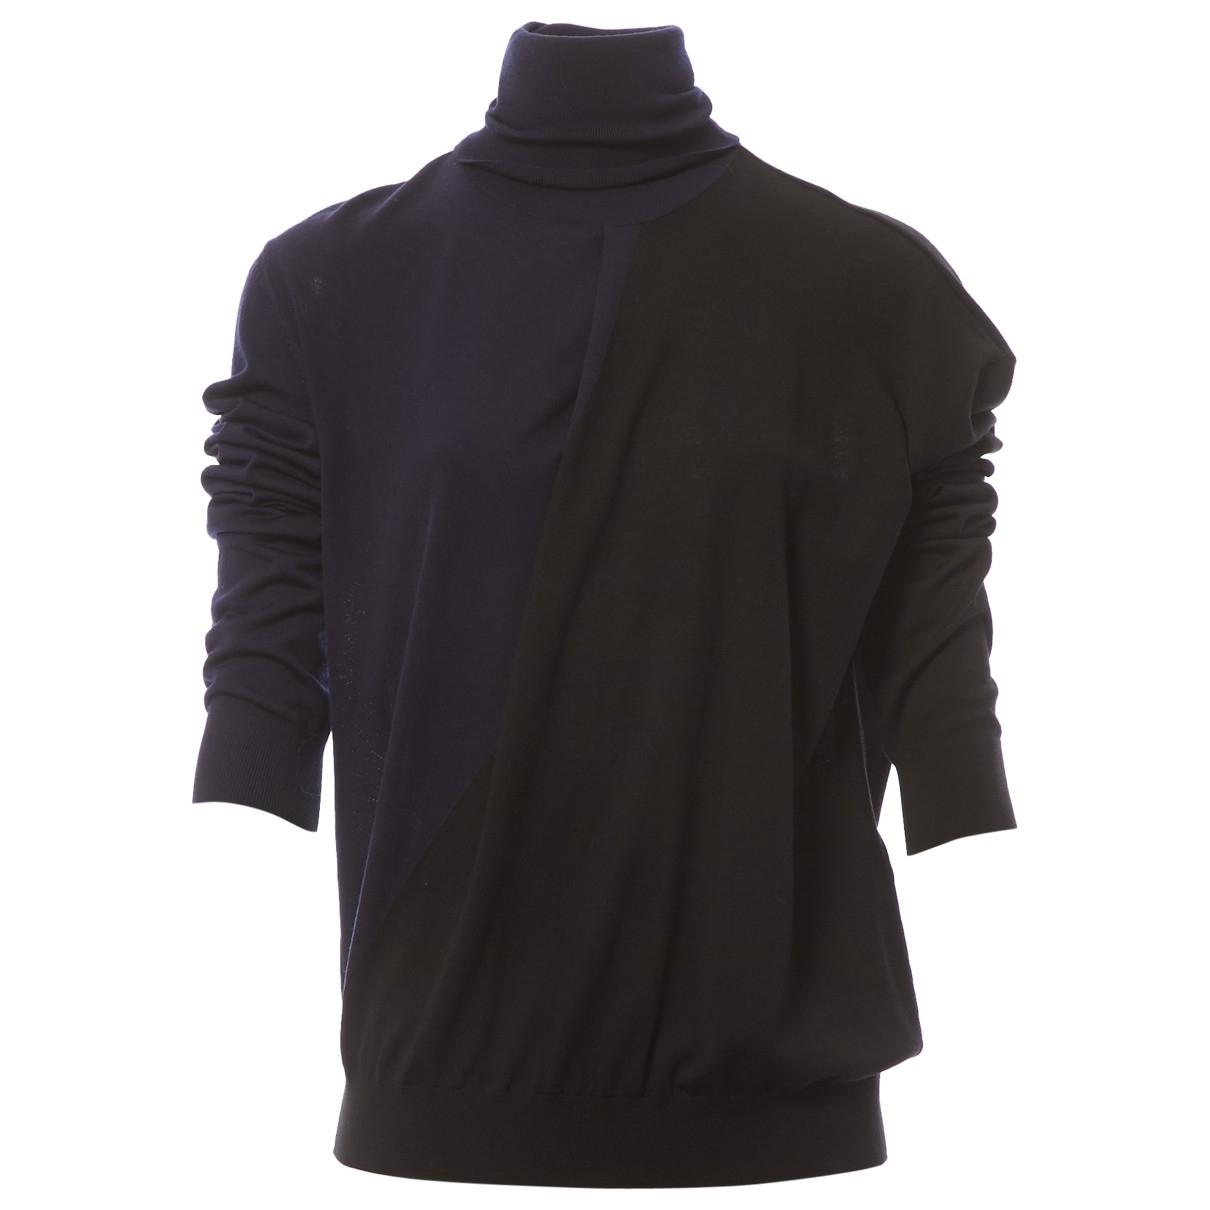 Celine \N Pullover in  Schwarz Wolle